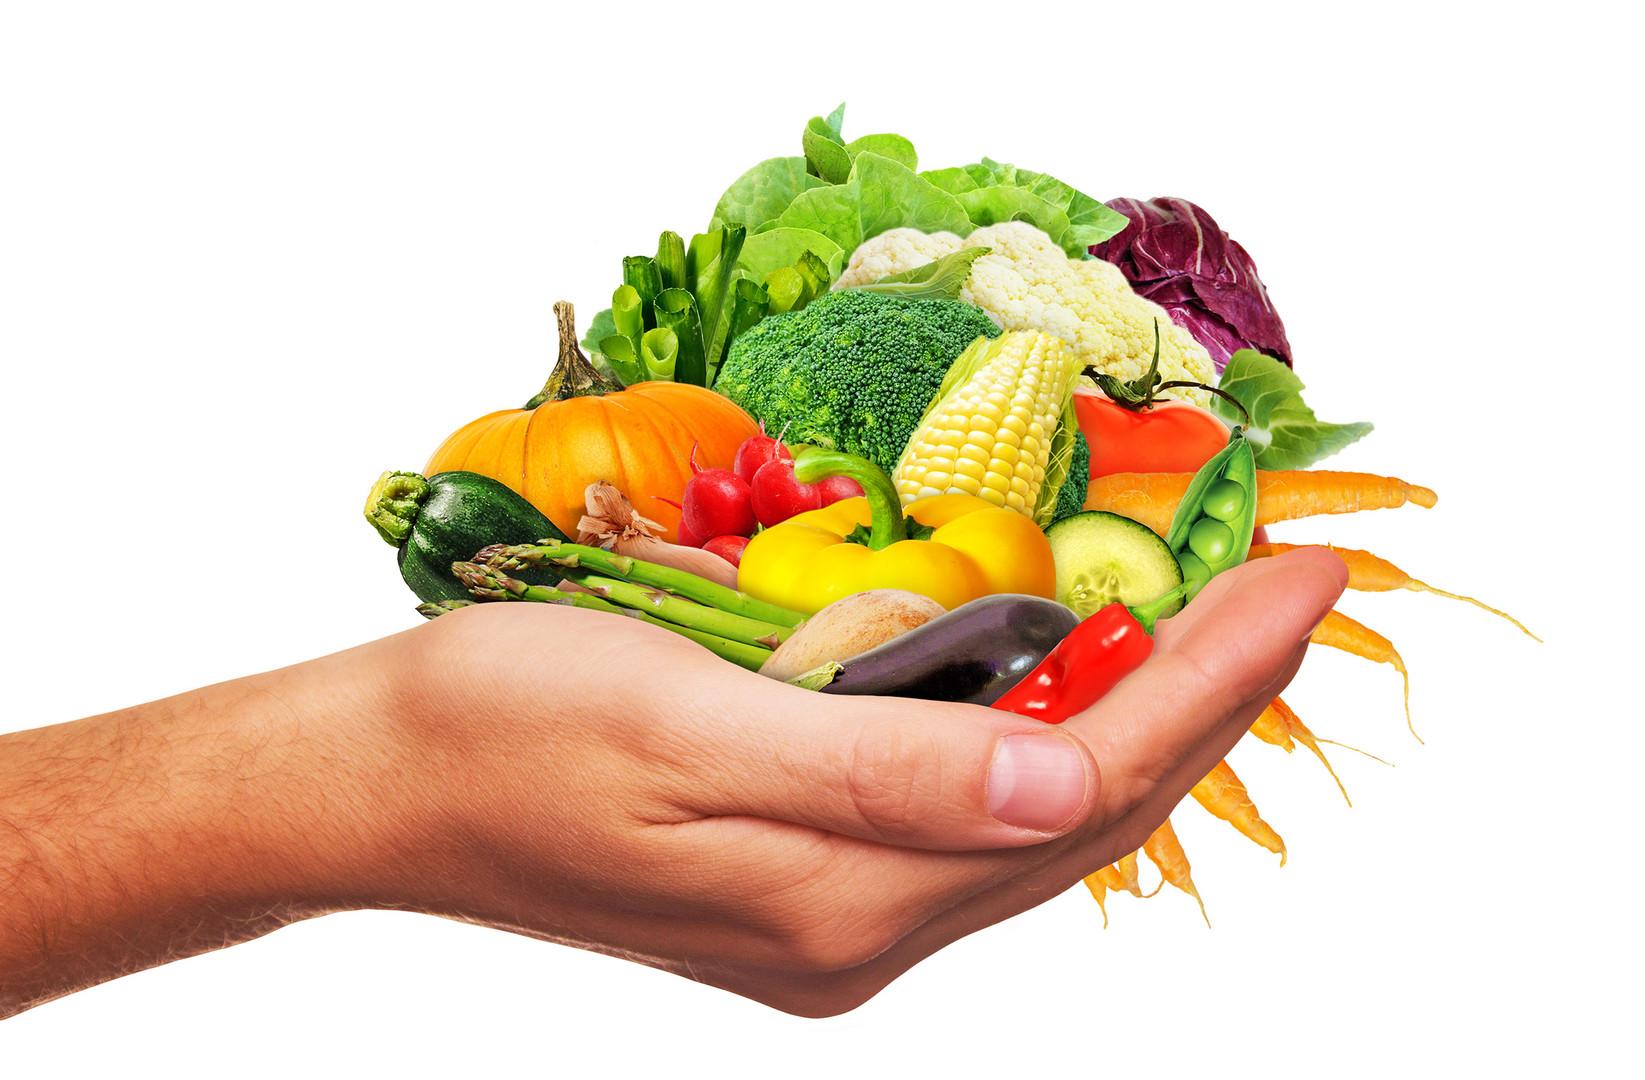 Hand_Gemüse_17_.jpg